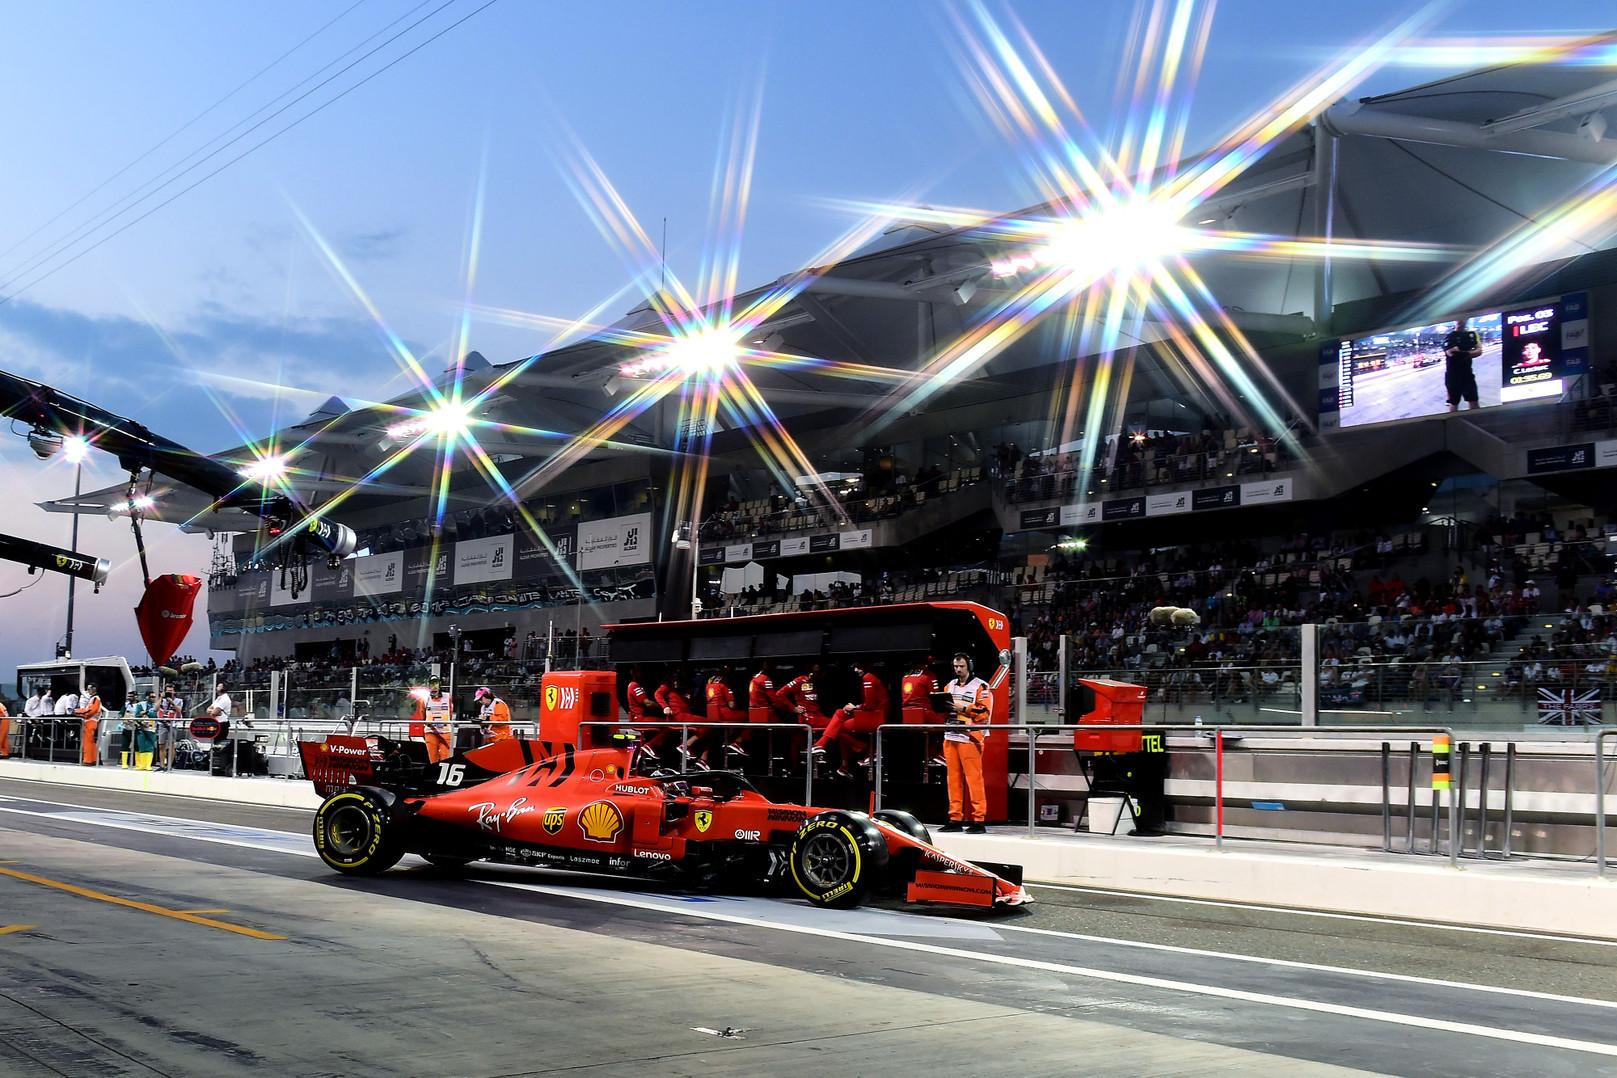 J. Villeneuve: Leclercas nepasiruošęs lyderio vaidmeniui